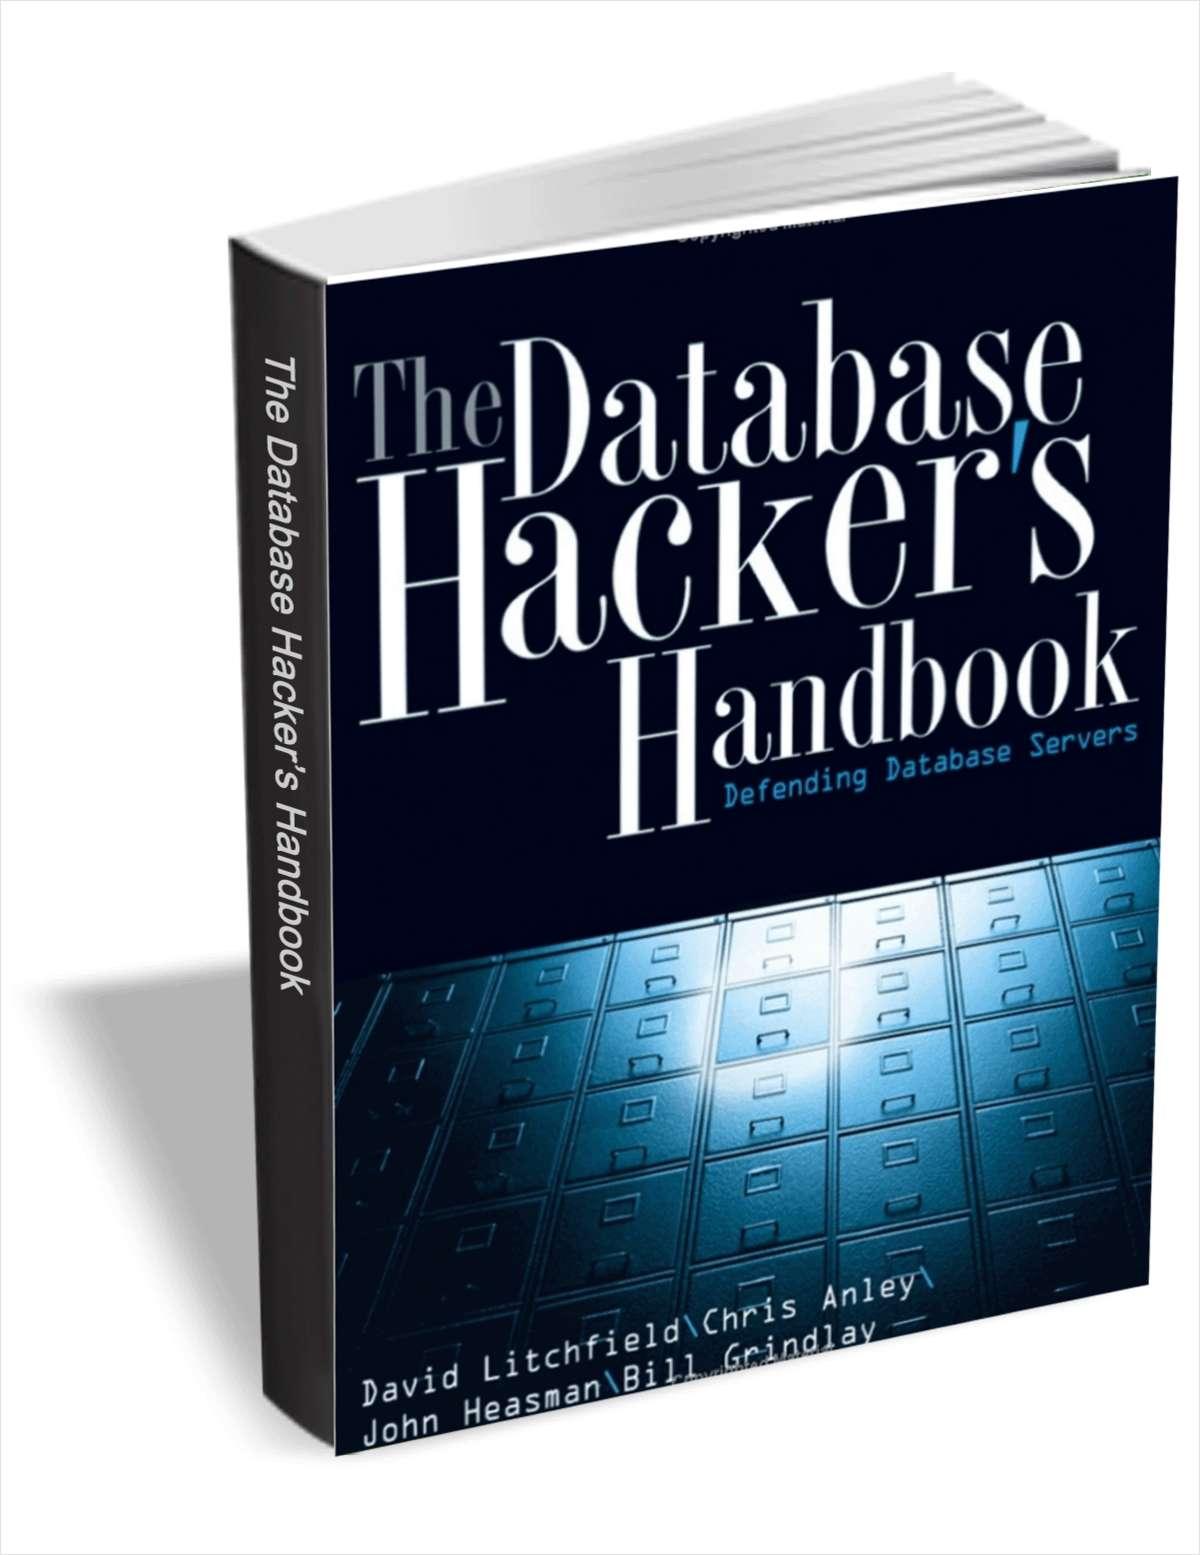 The Database Hacker's Handbook: Defending Database Servers (a $50 value!)